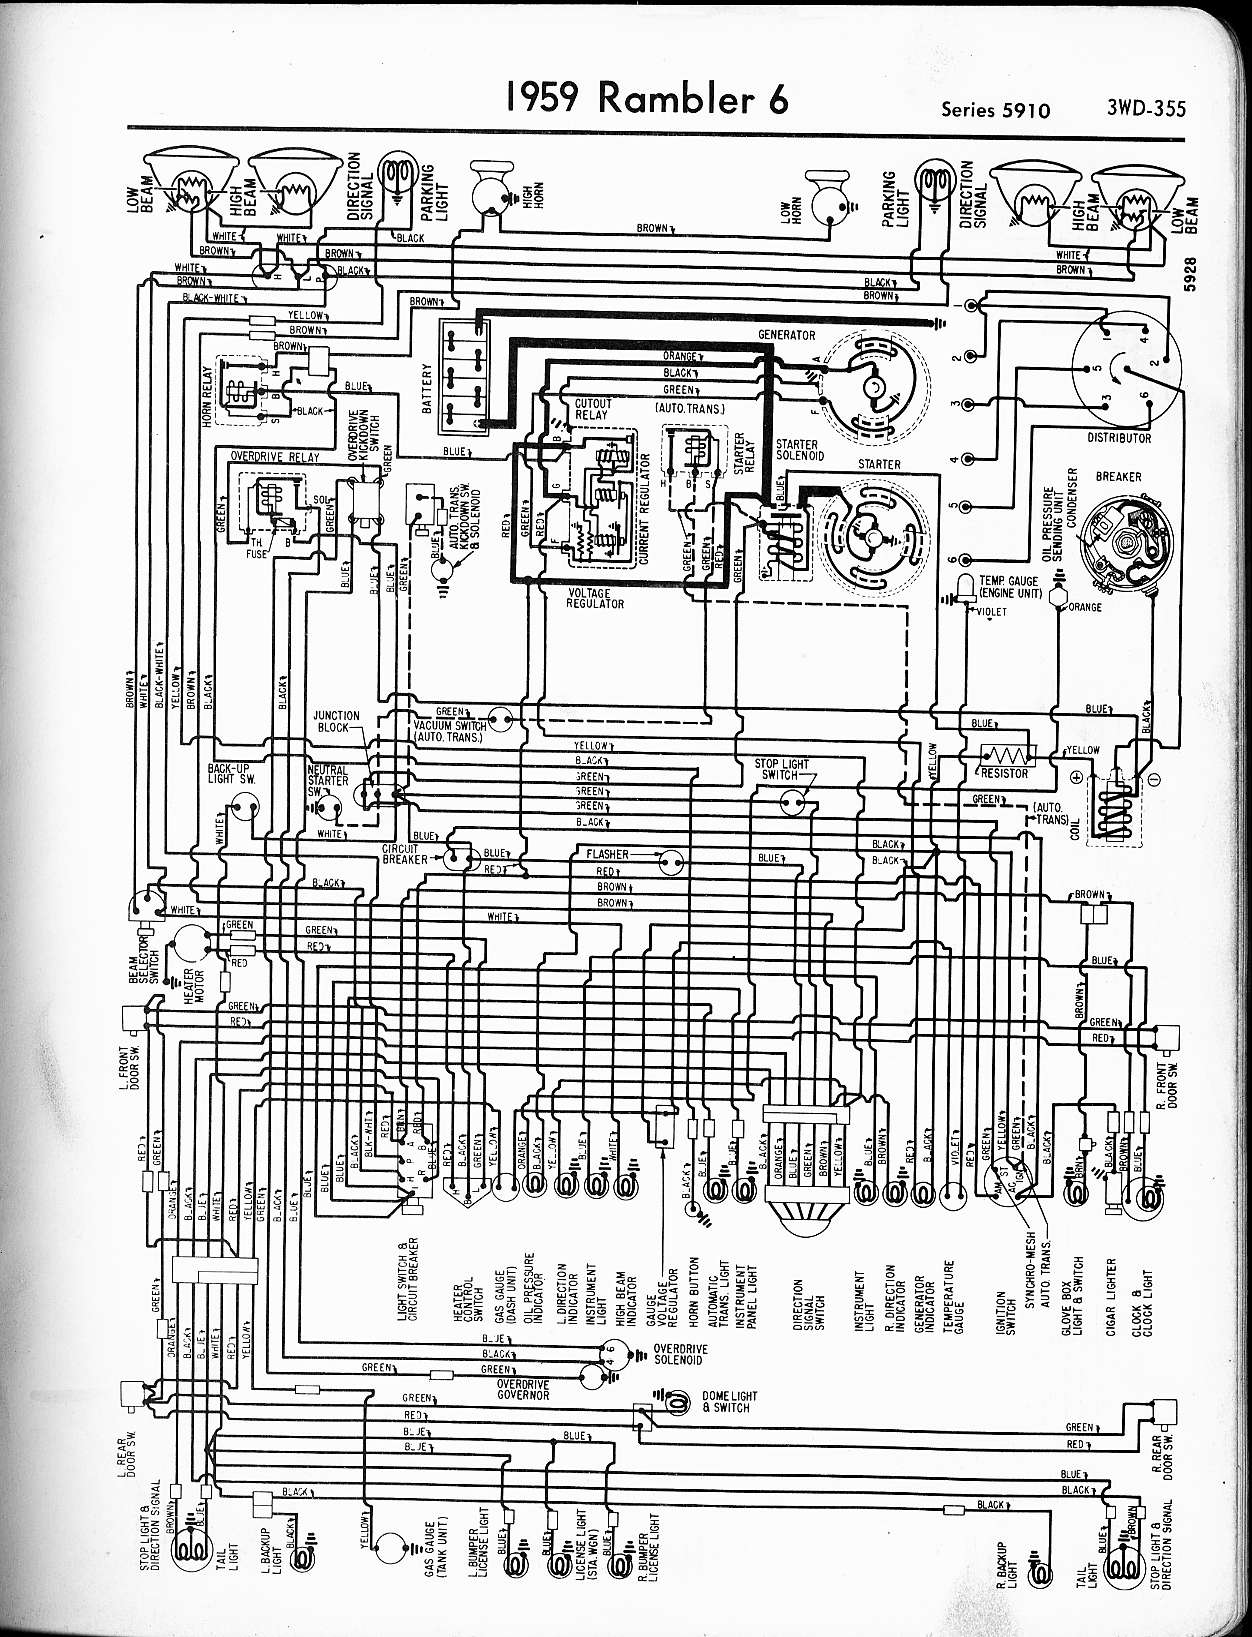 Rambler wiring diagrams - The Old Car Manual Project